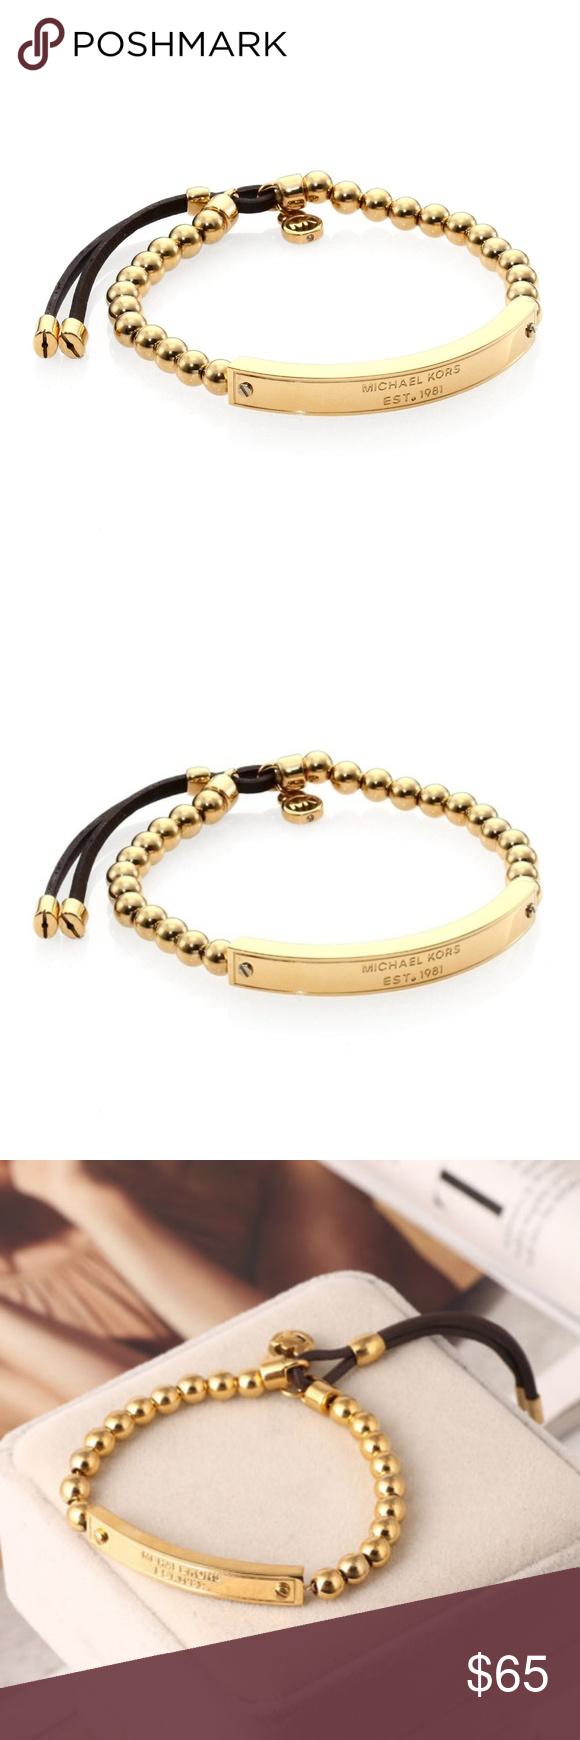 a7cf0796efad4 Michael Kors Heritage Plaque Beaded Bracelet Michael Kors Gold Heritage  Plaque Logo Beaded Leather Bracelet New